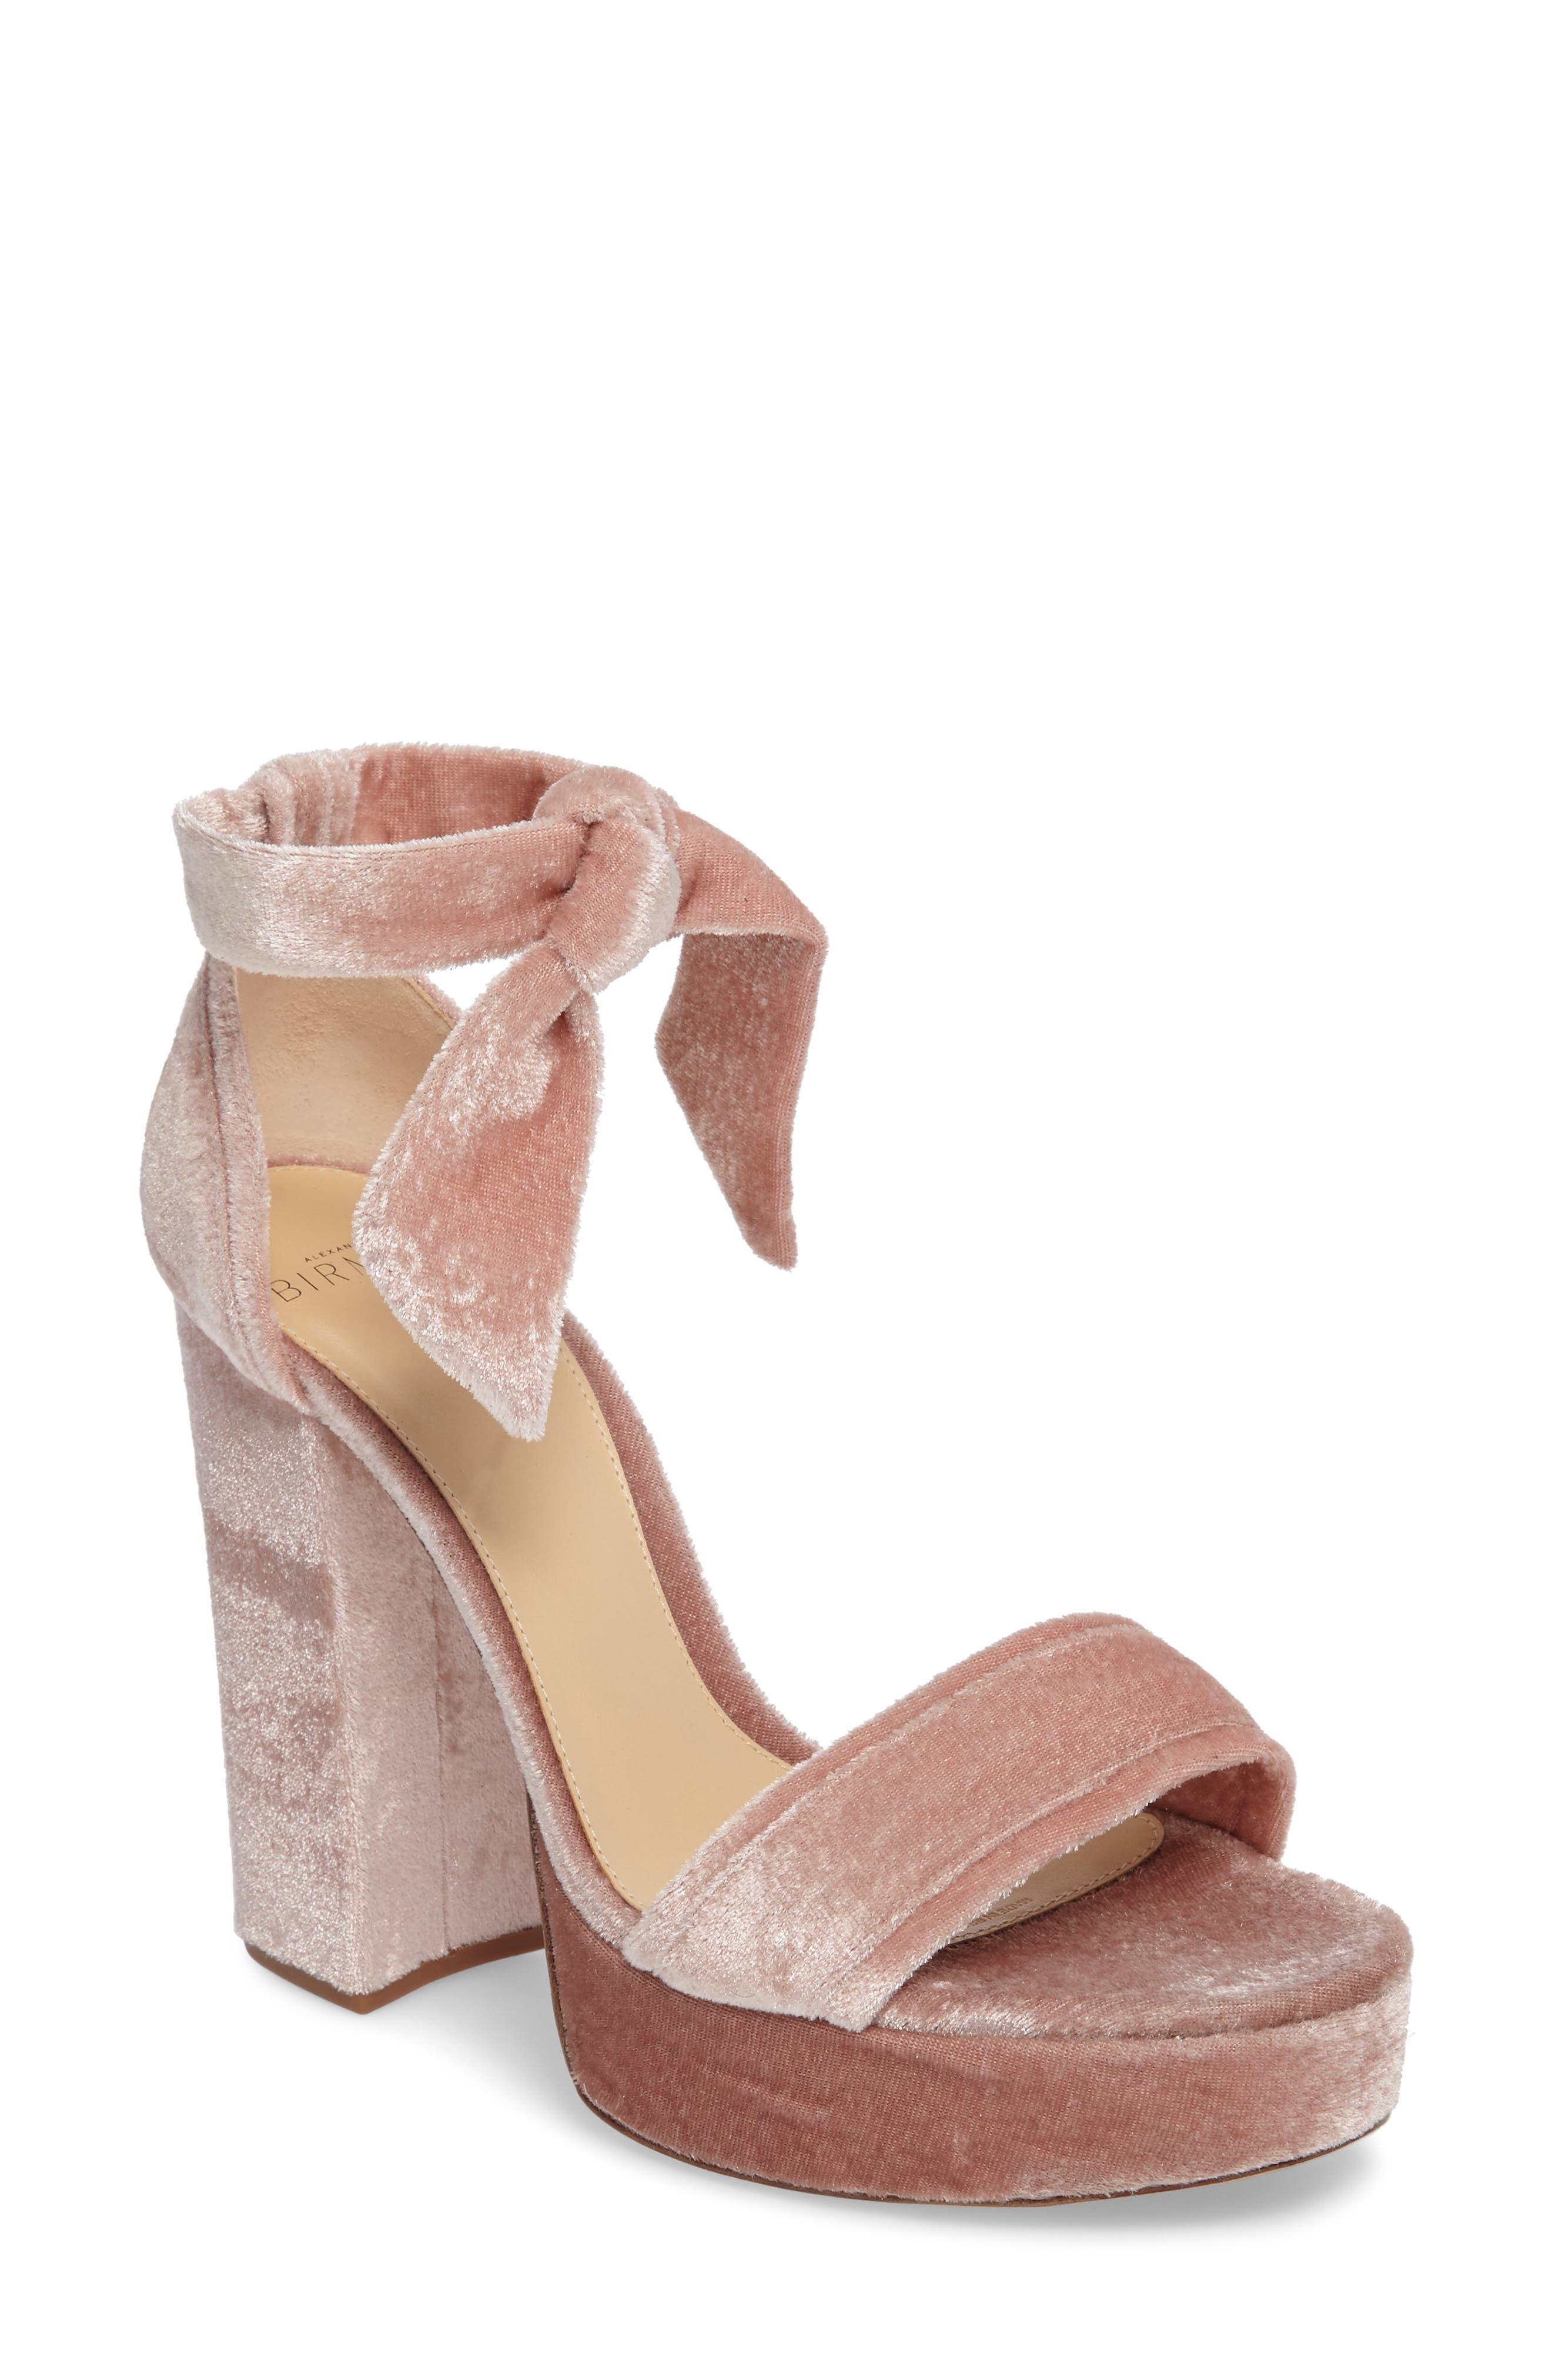 Alternate Image 1 Selected - Alexandre Birman Celine Platform Sandal (Women)